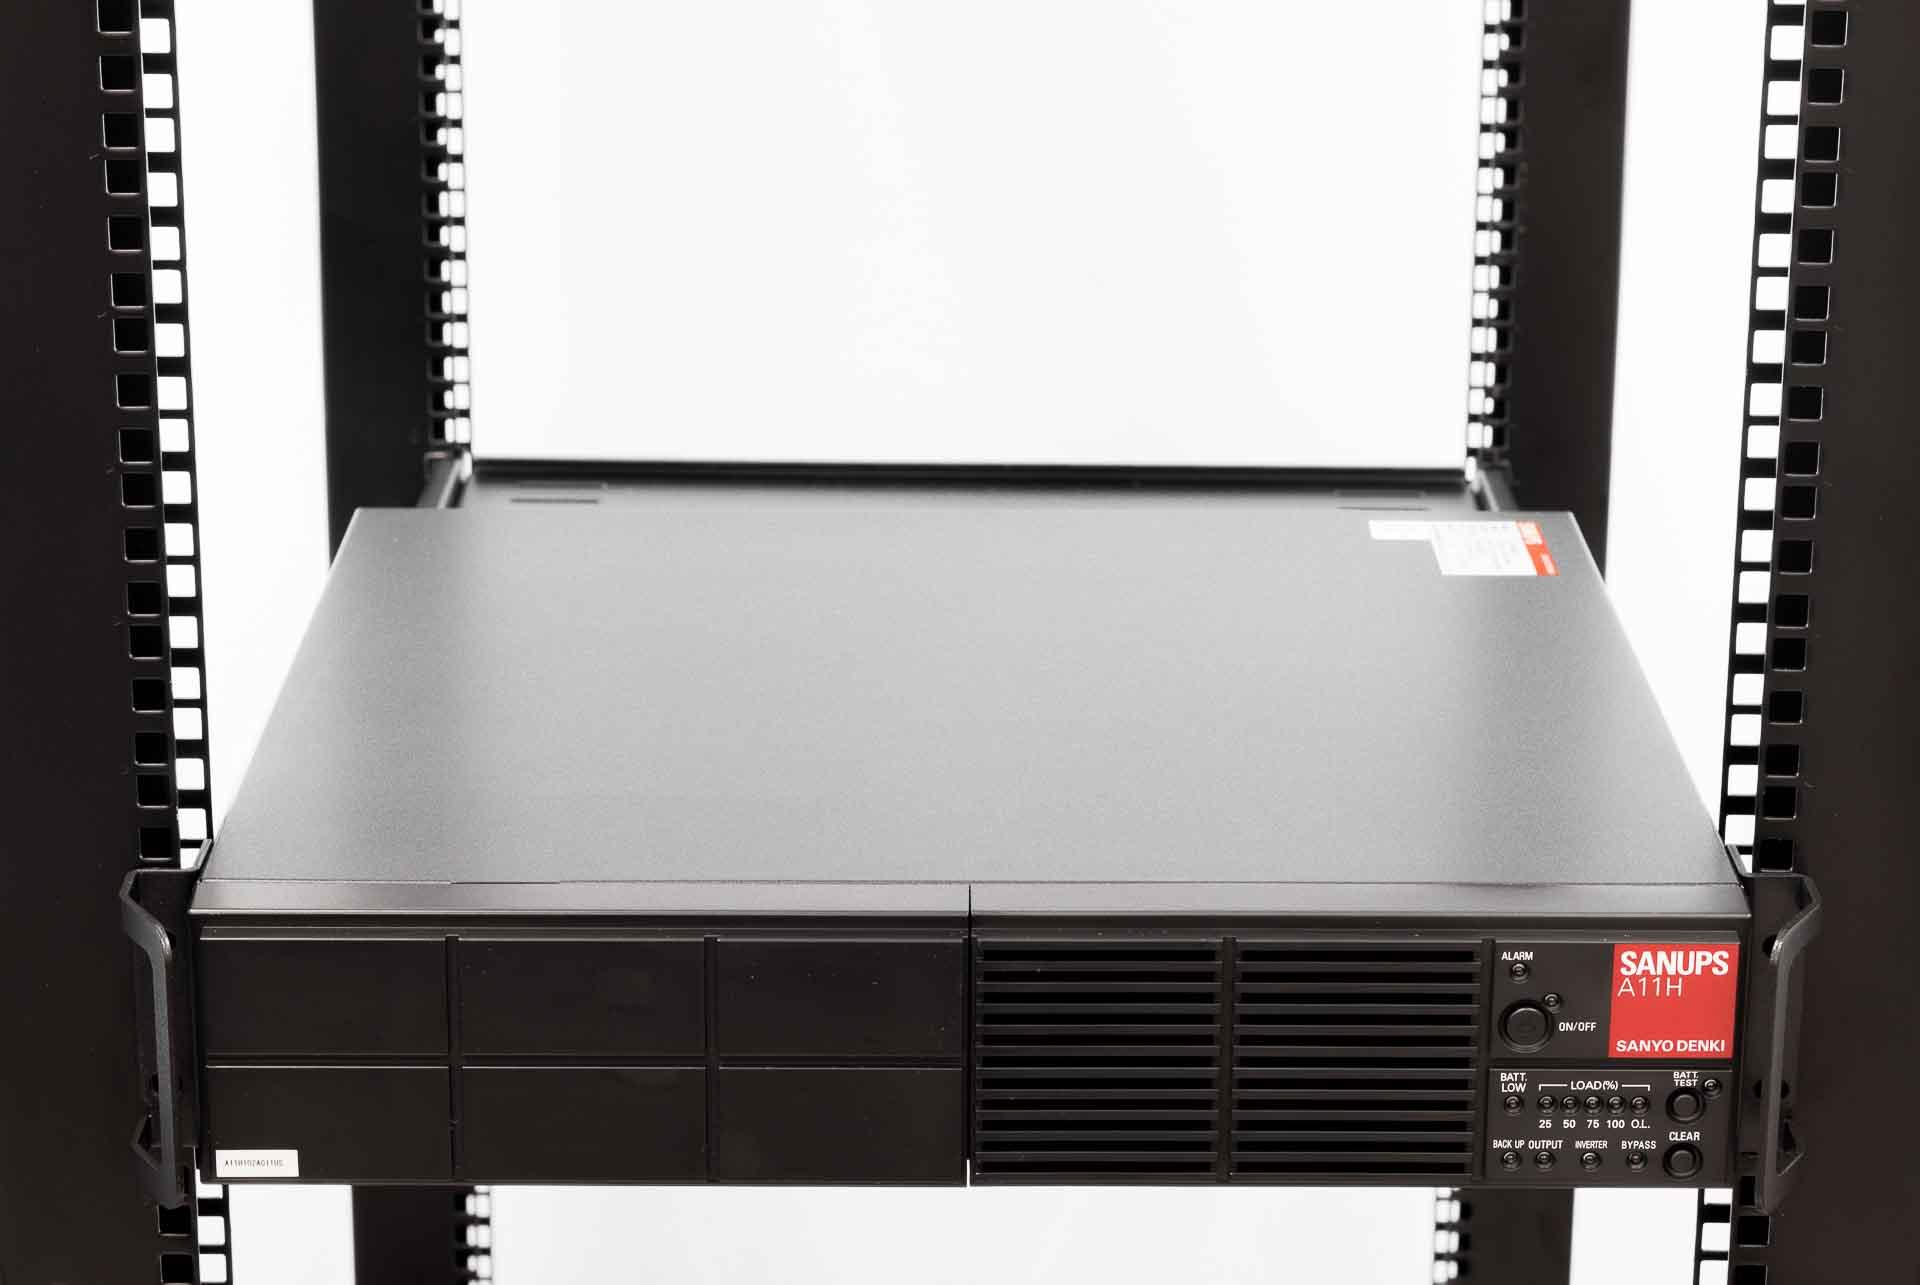 1kva ups 1kva online rack mount ups republic power systems